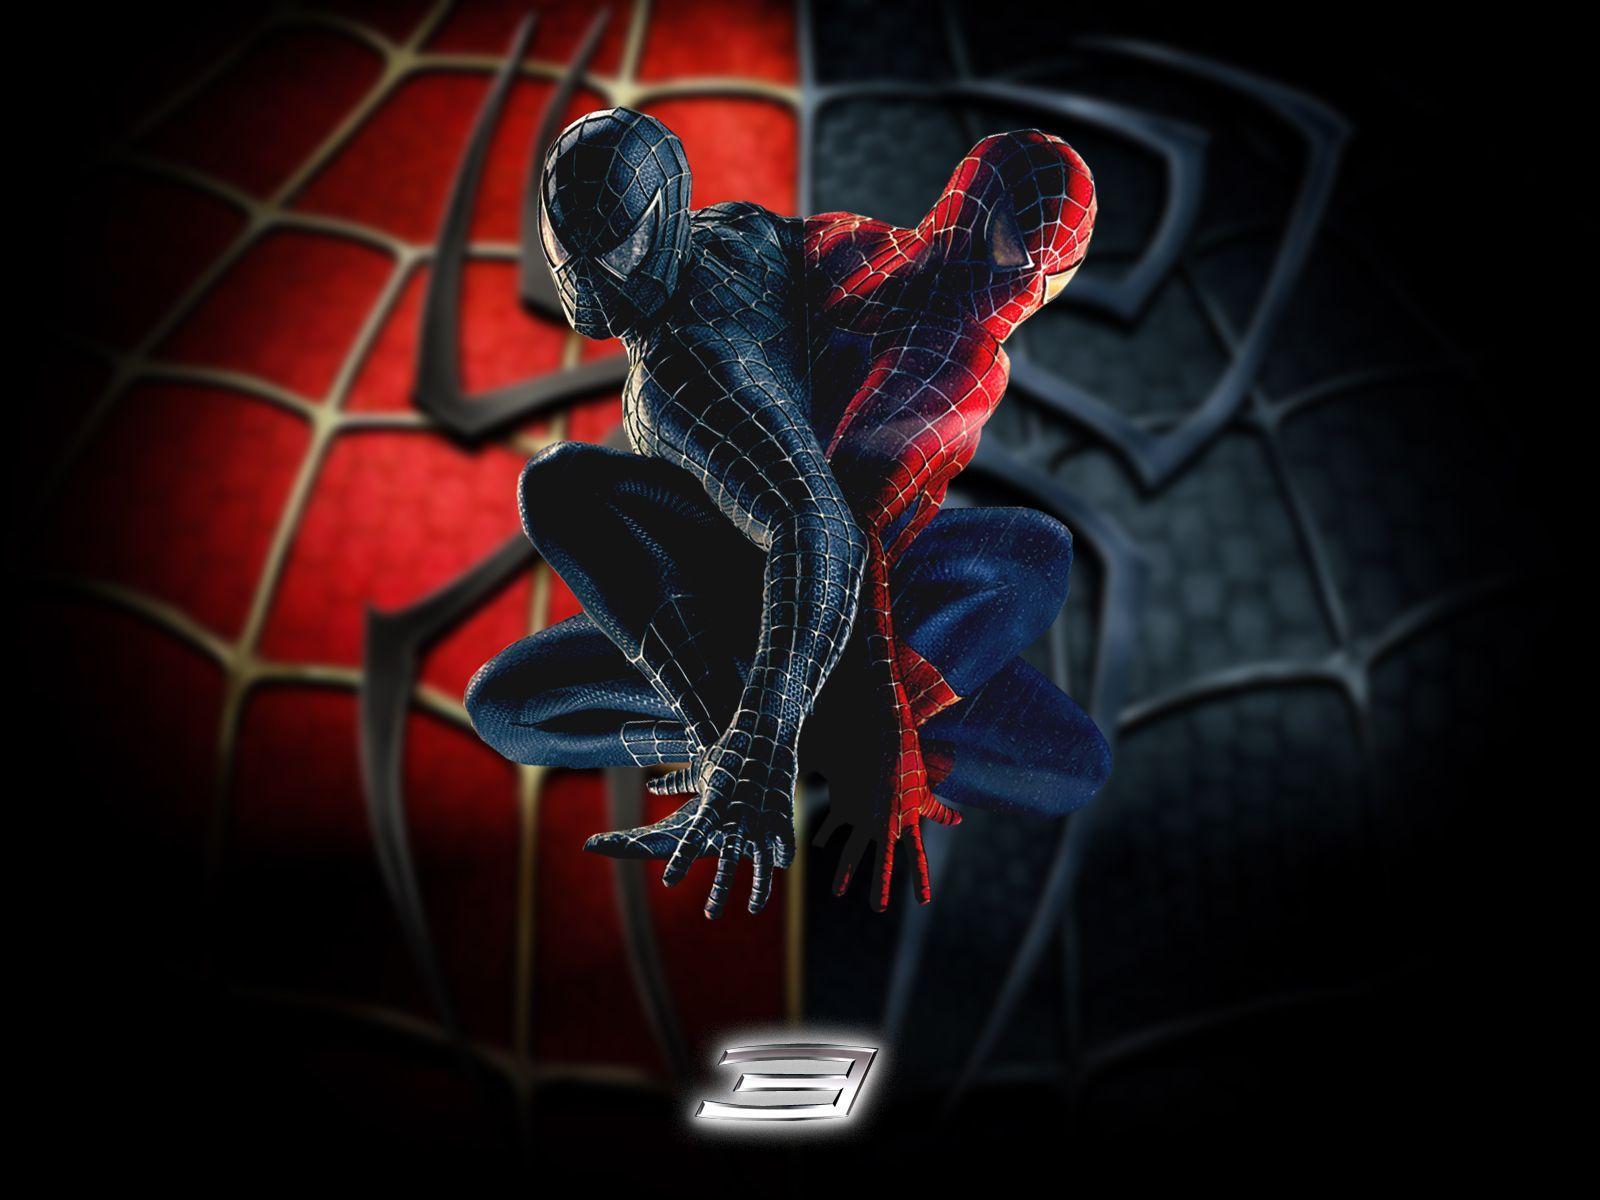 Spiderman Vs Black Spiderman Wallpapers Wallpaper Cave